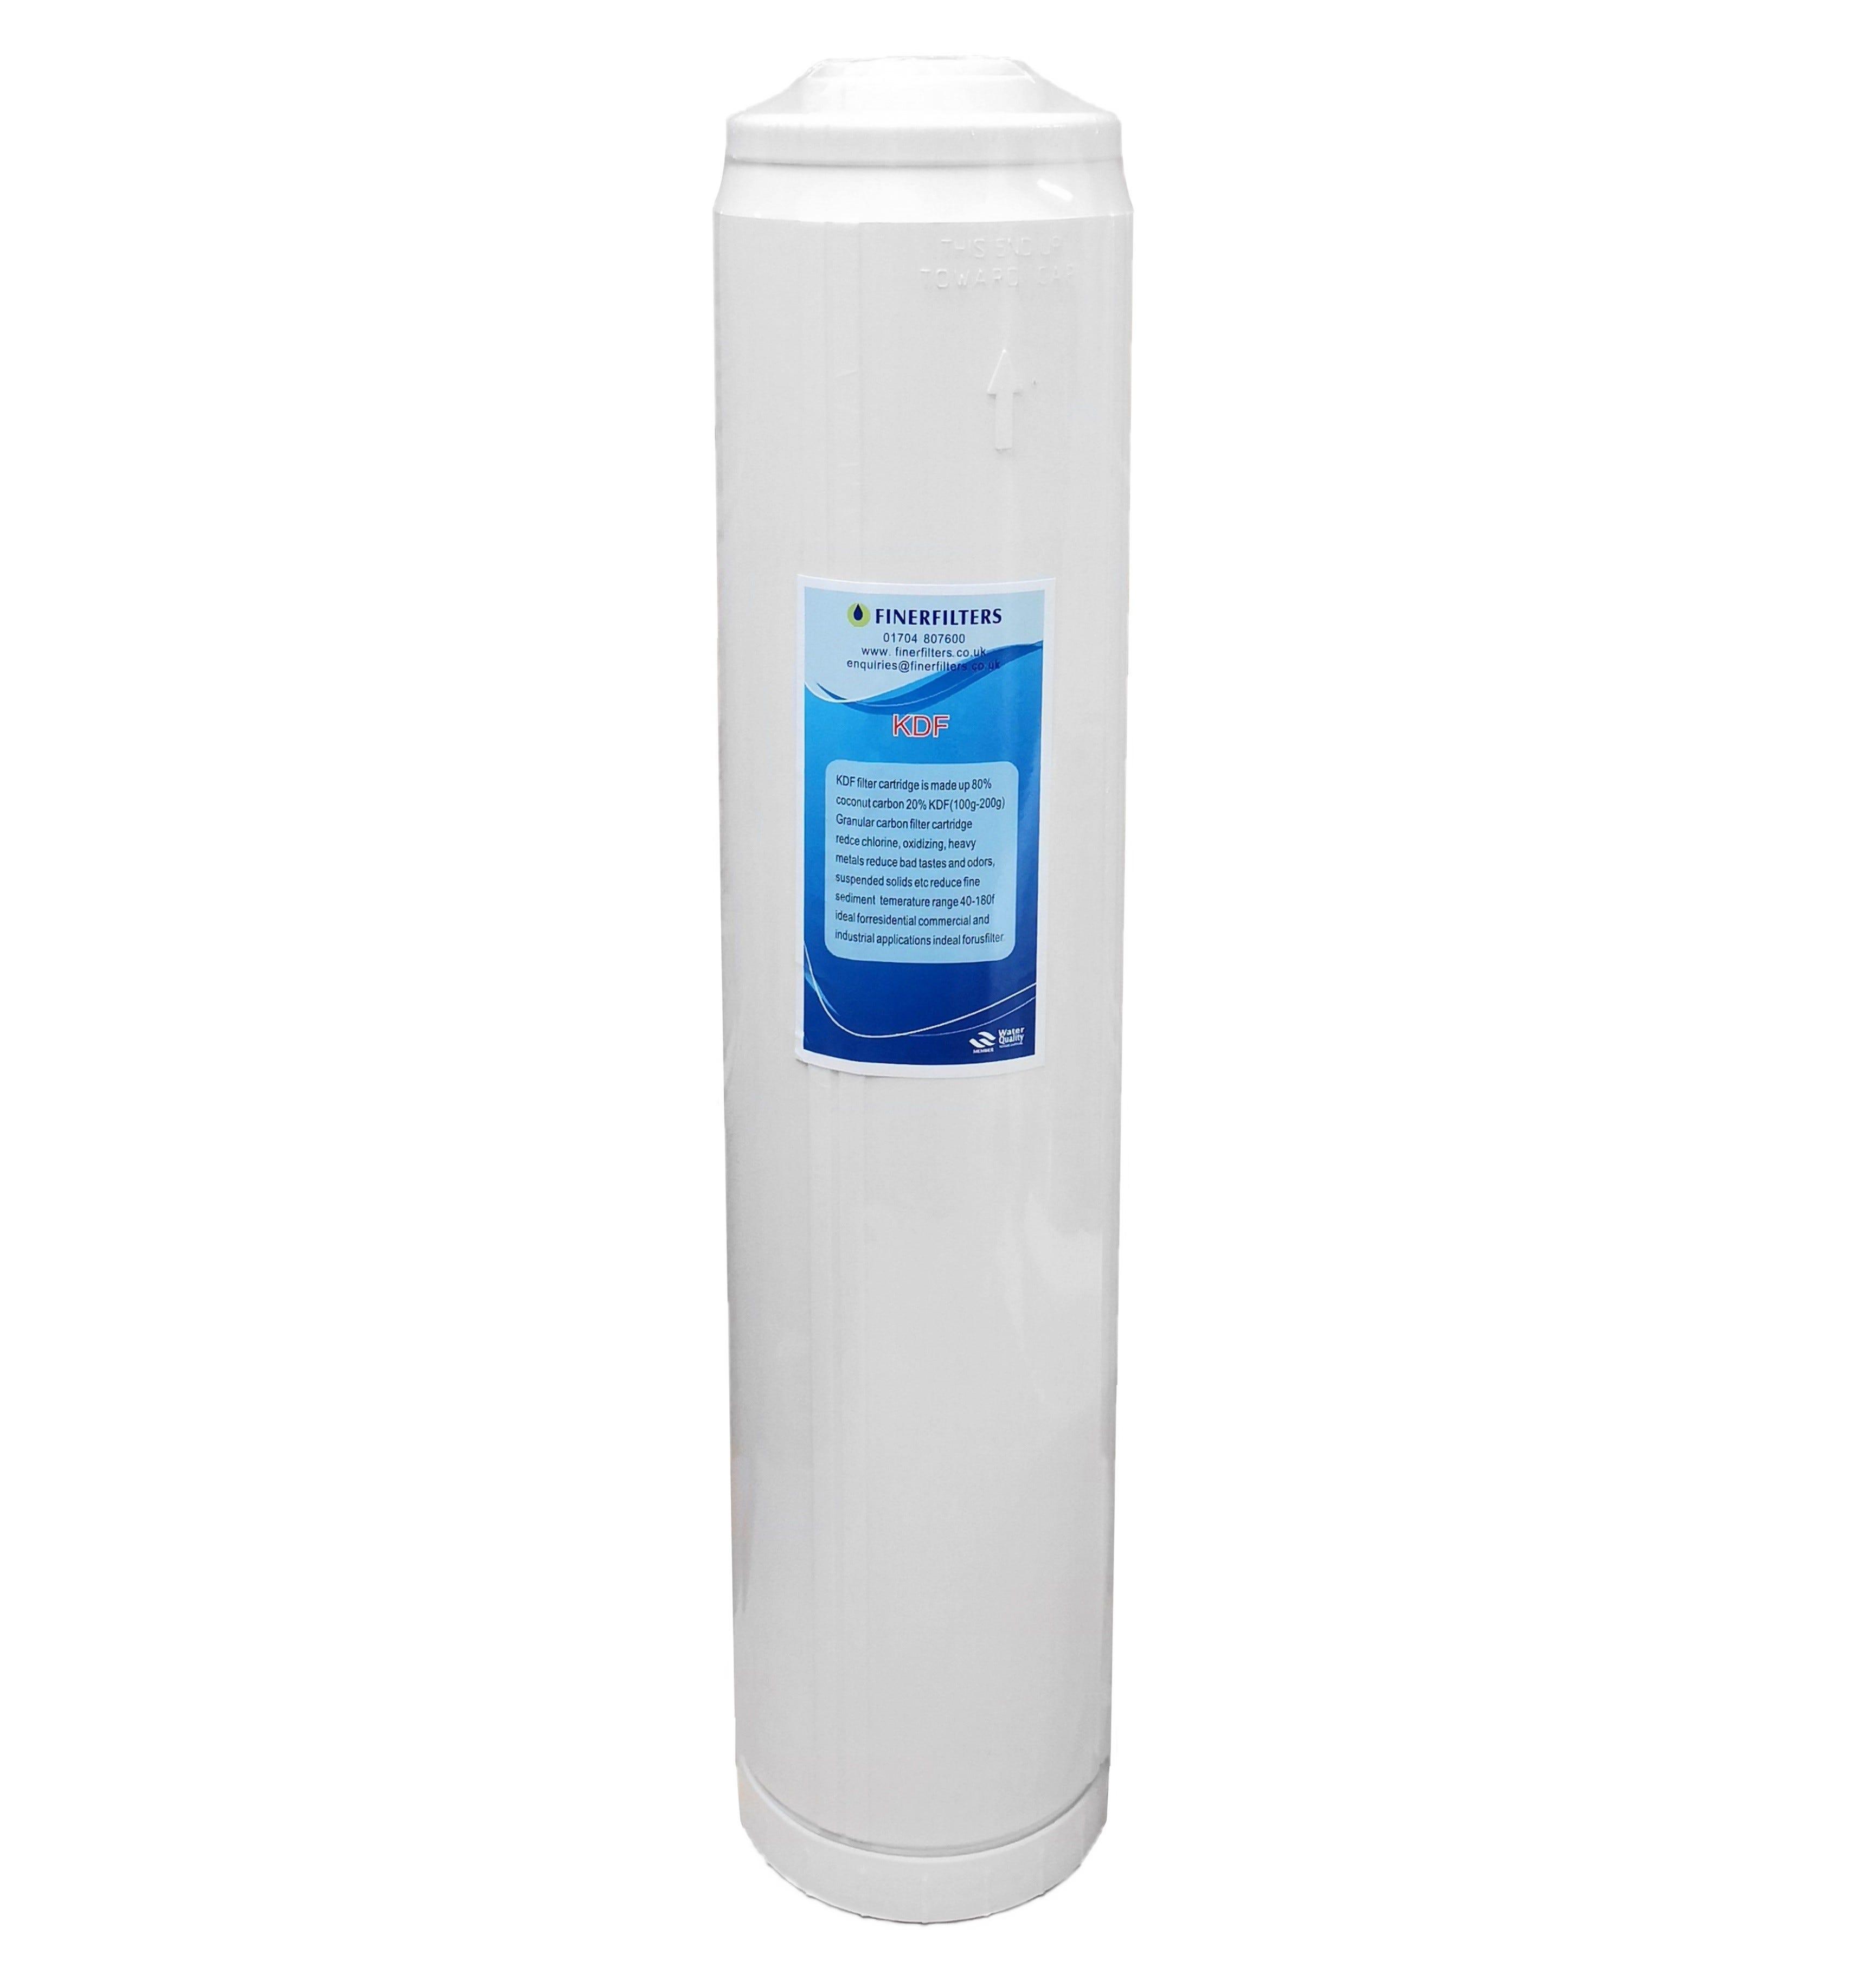 "Finerfilters 20"" x 4.5"" Jumbo GAC/KDF Water Filter"